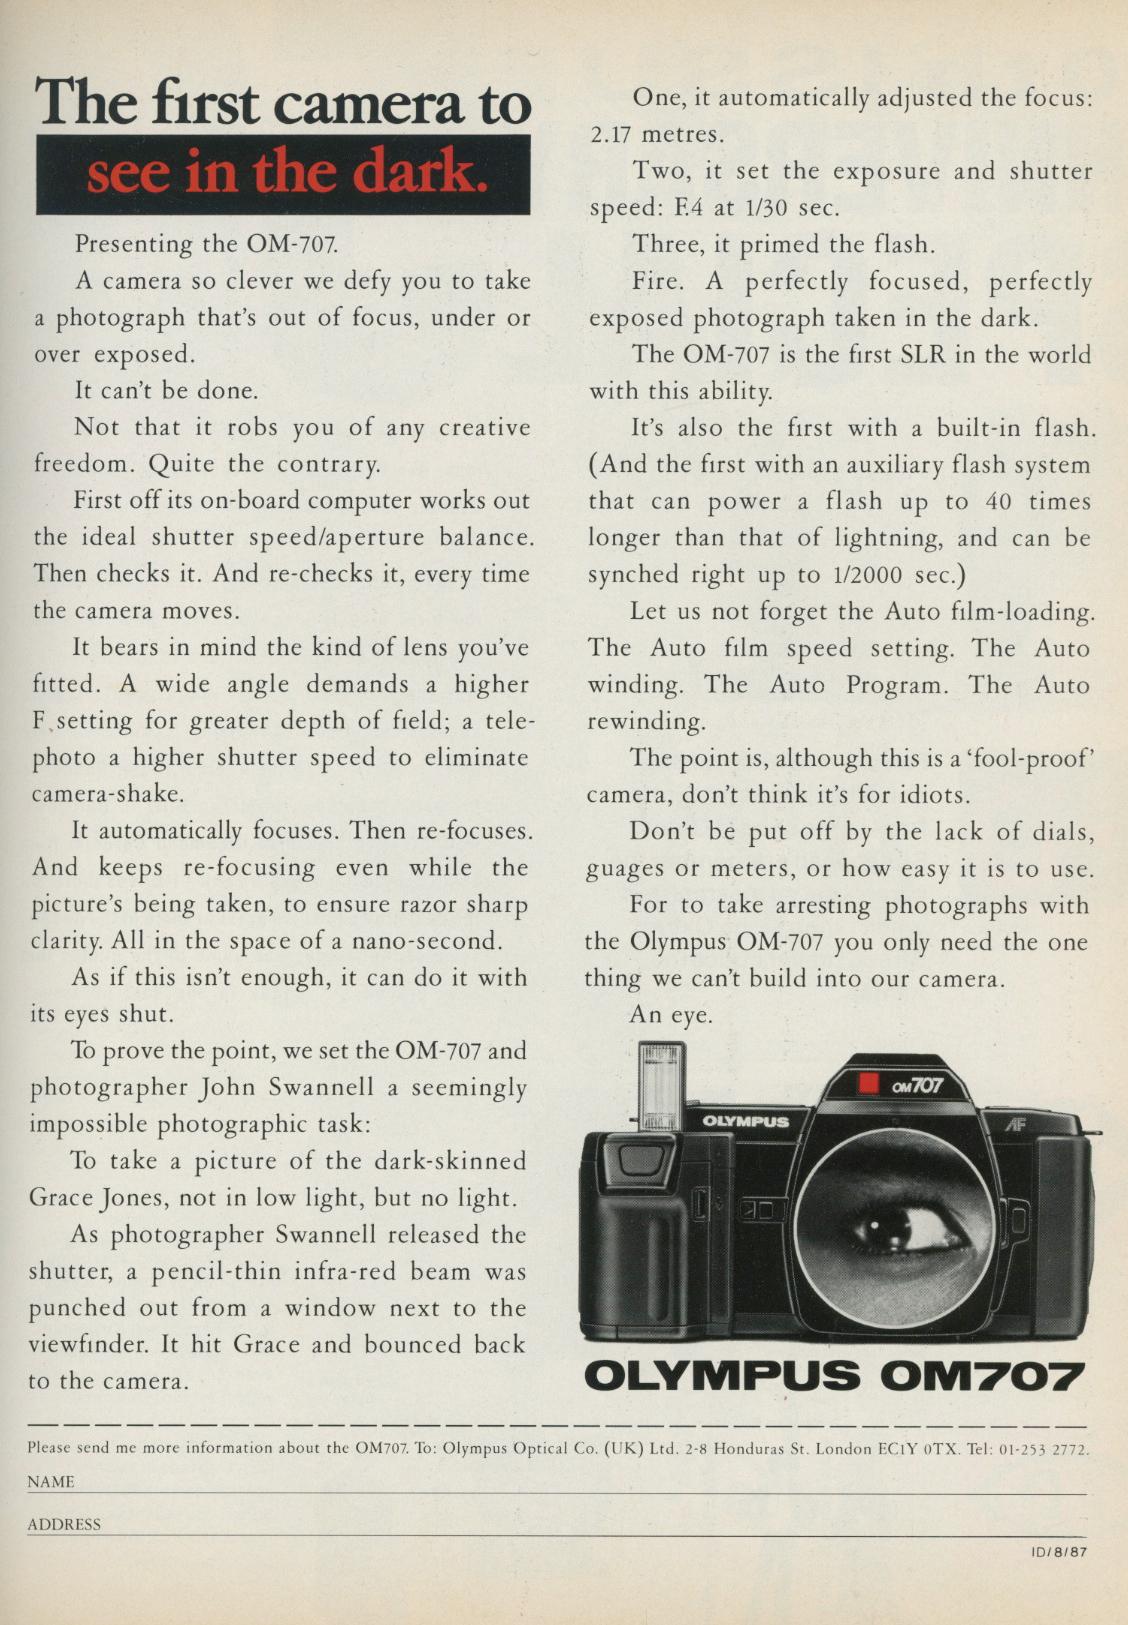 Grace Jones, Olympus, OM707, Advert, i-D, 1987